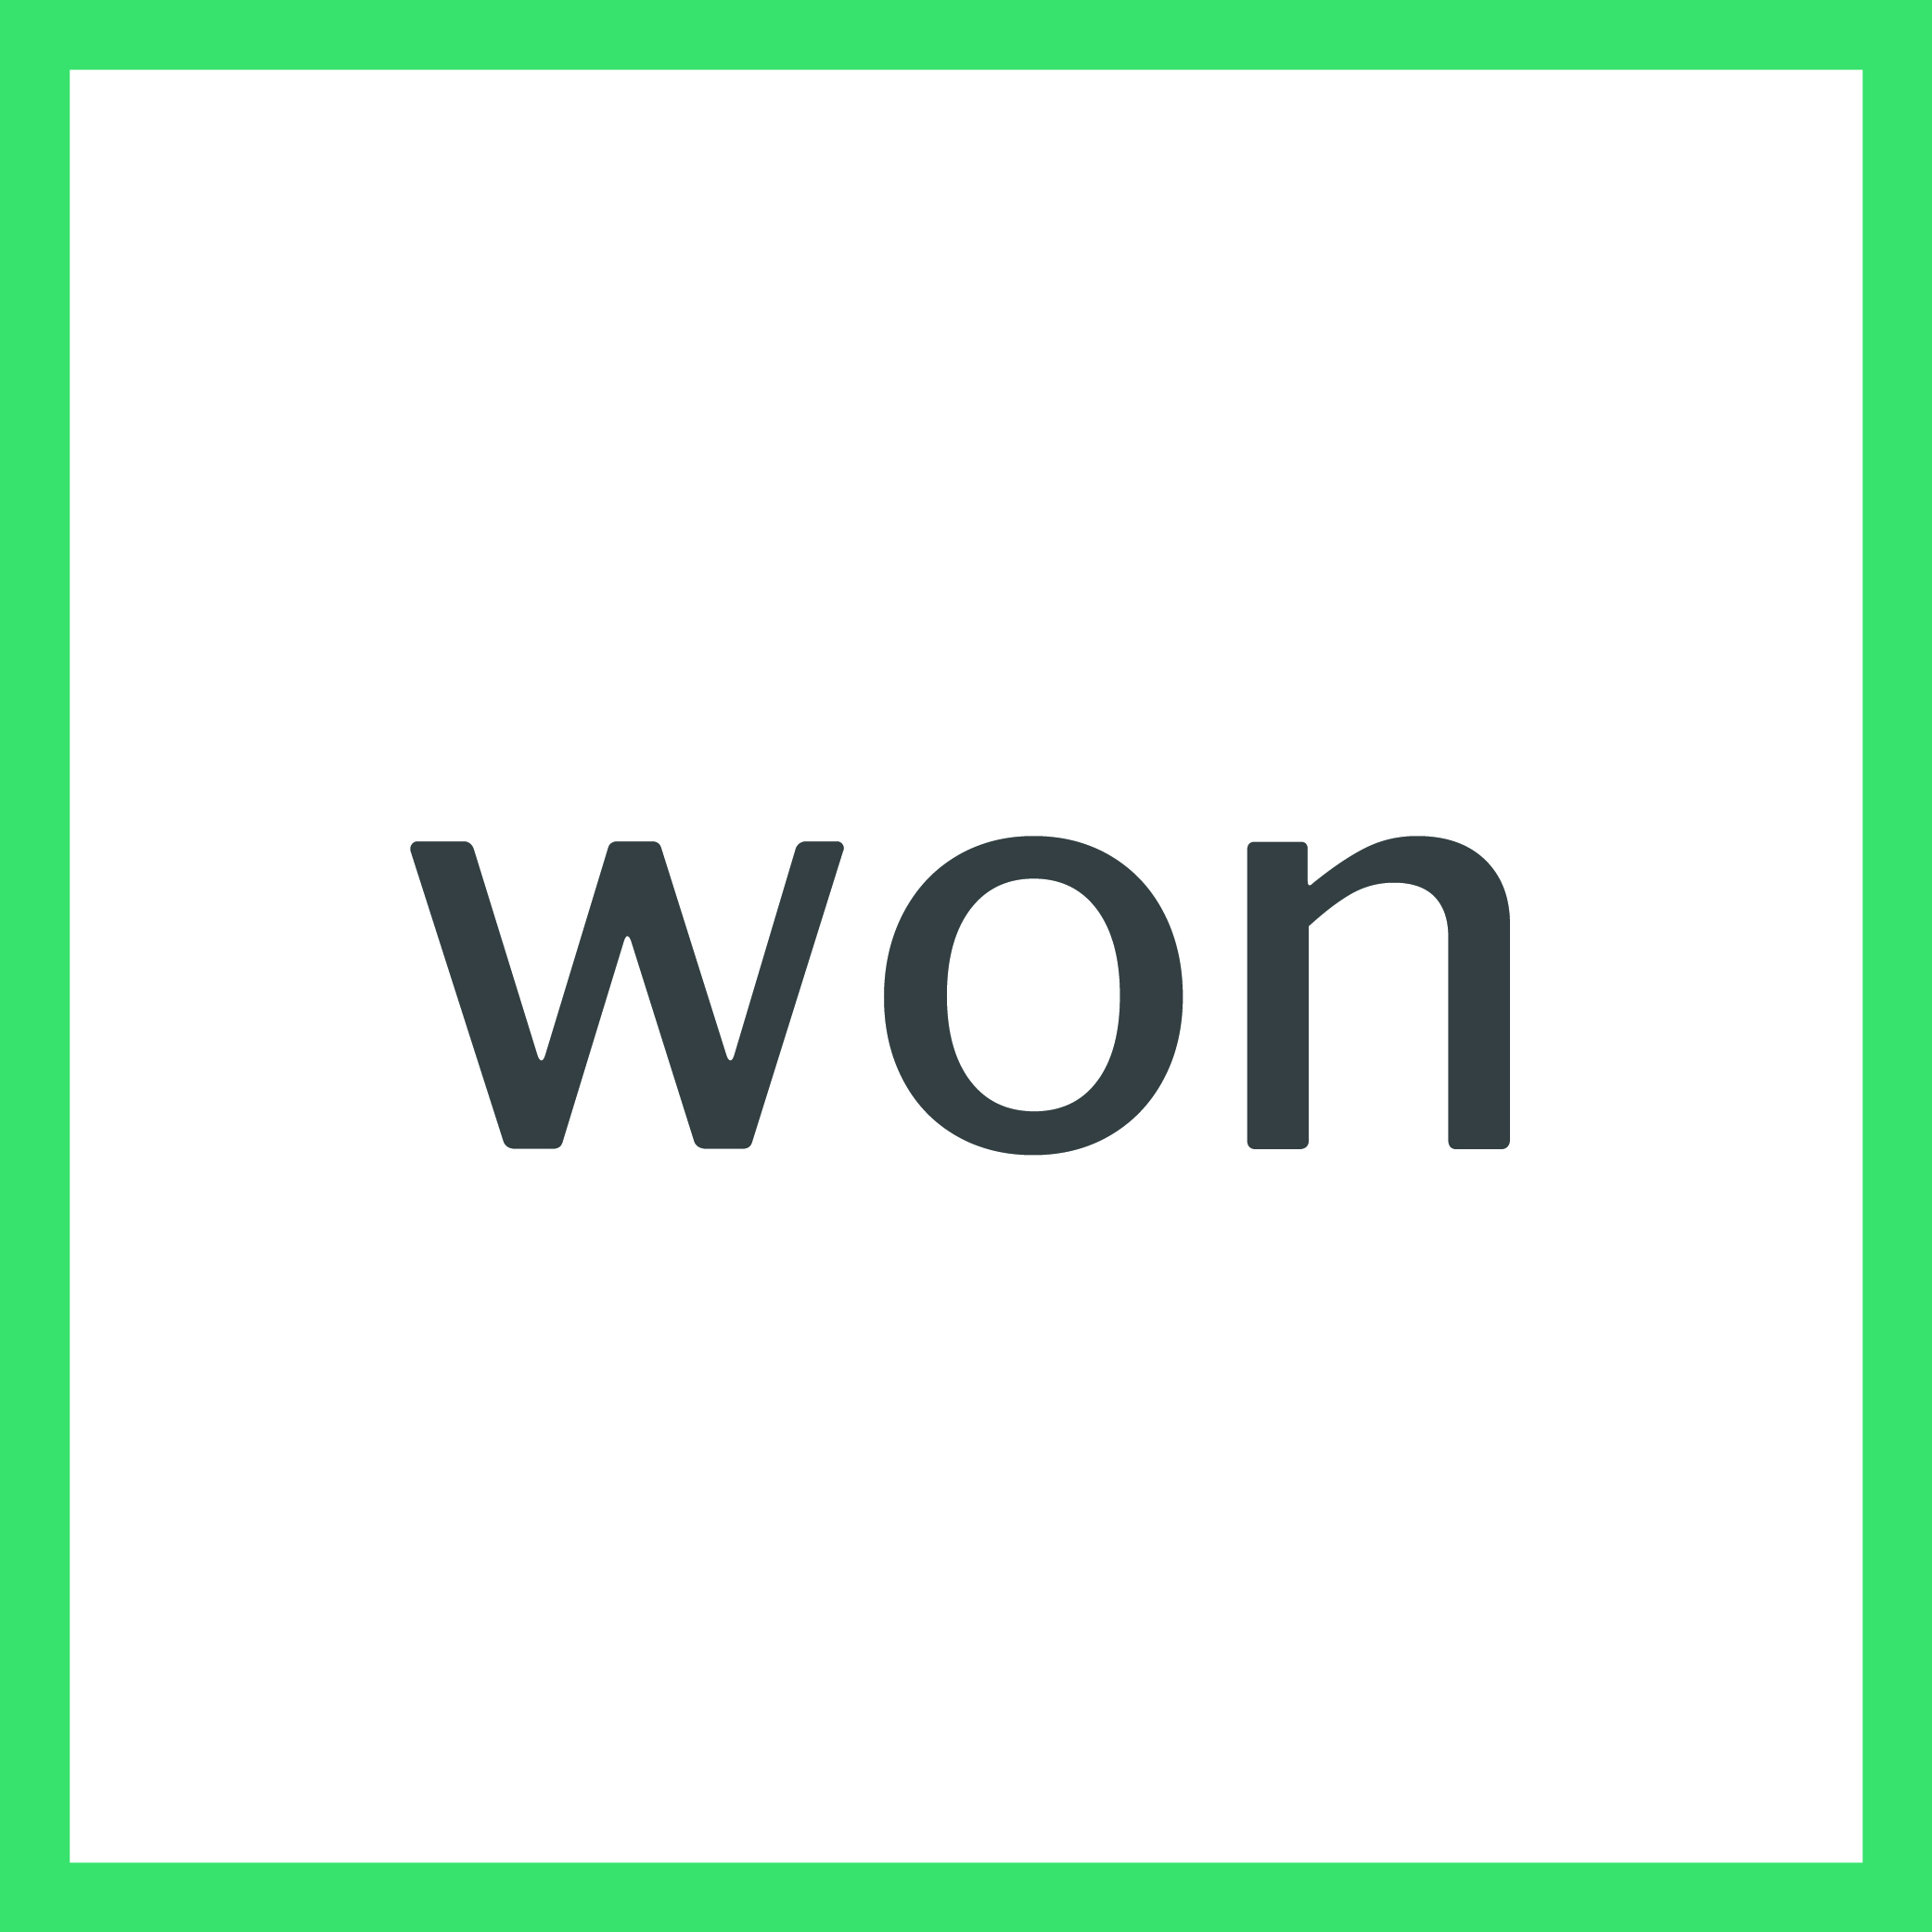 :won: